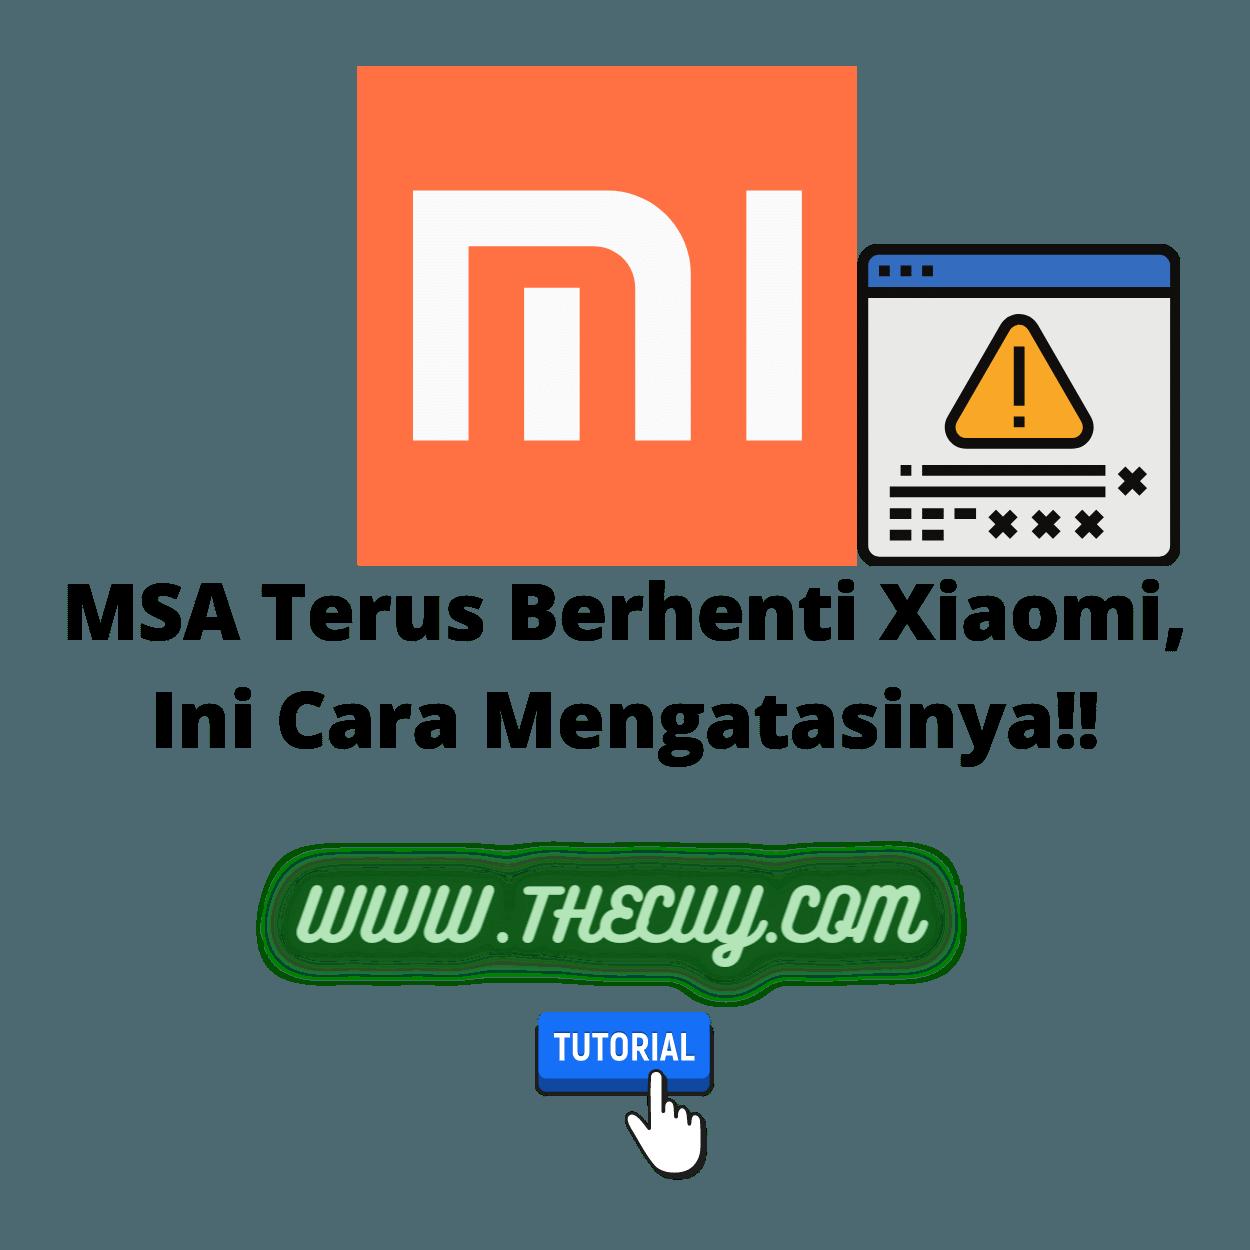 MSA Terus Berhenti Xiaomi, Ini Cara Mengatasinya!!